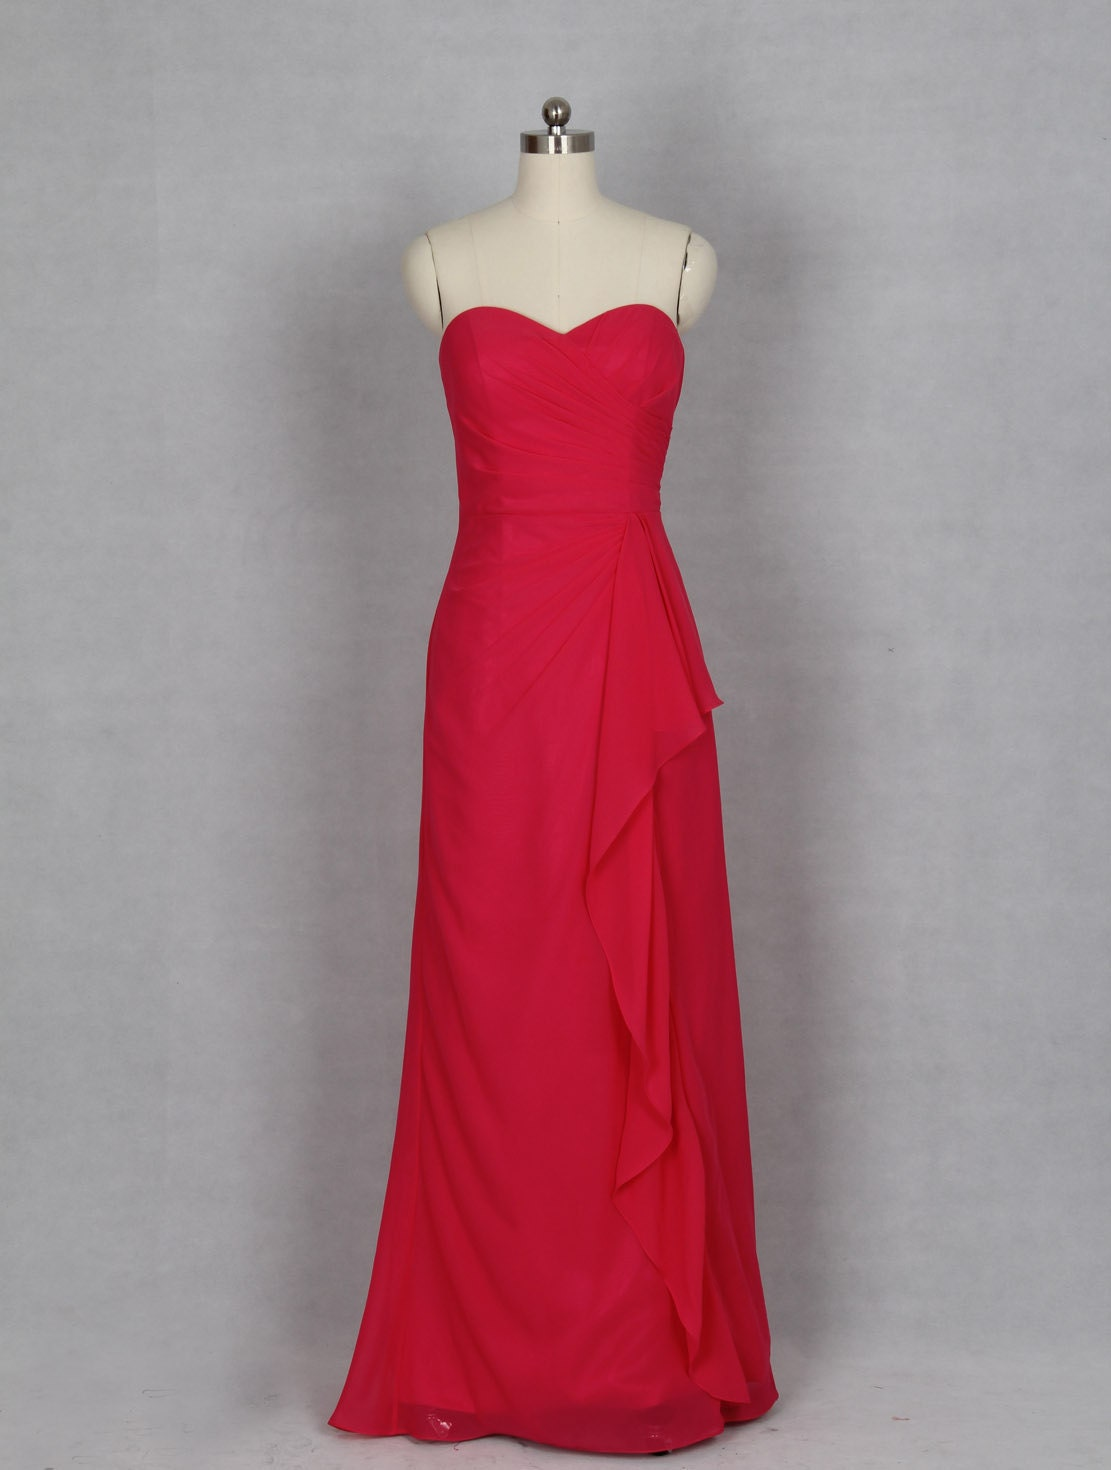 Red Prom Dress A line Sweetheart Long Chiffon Evening Dress